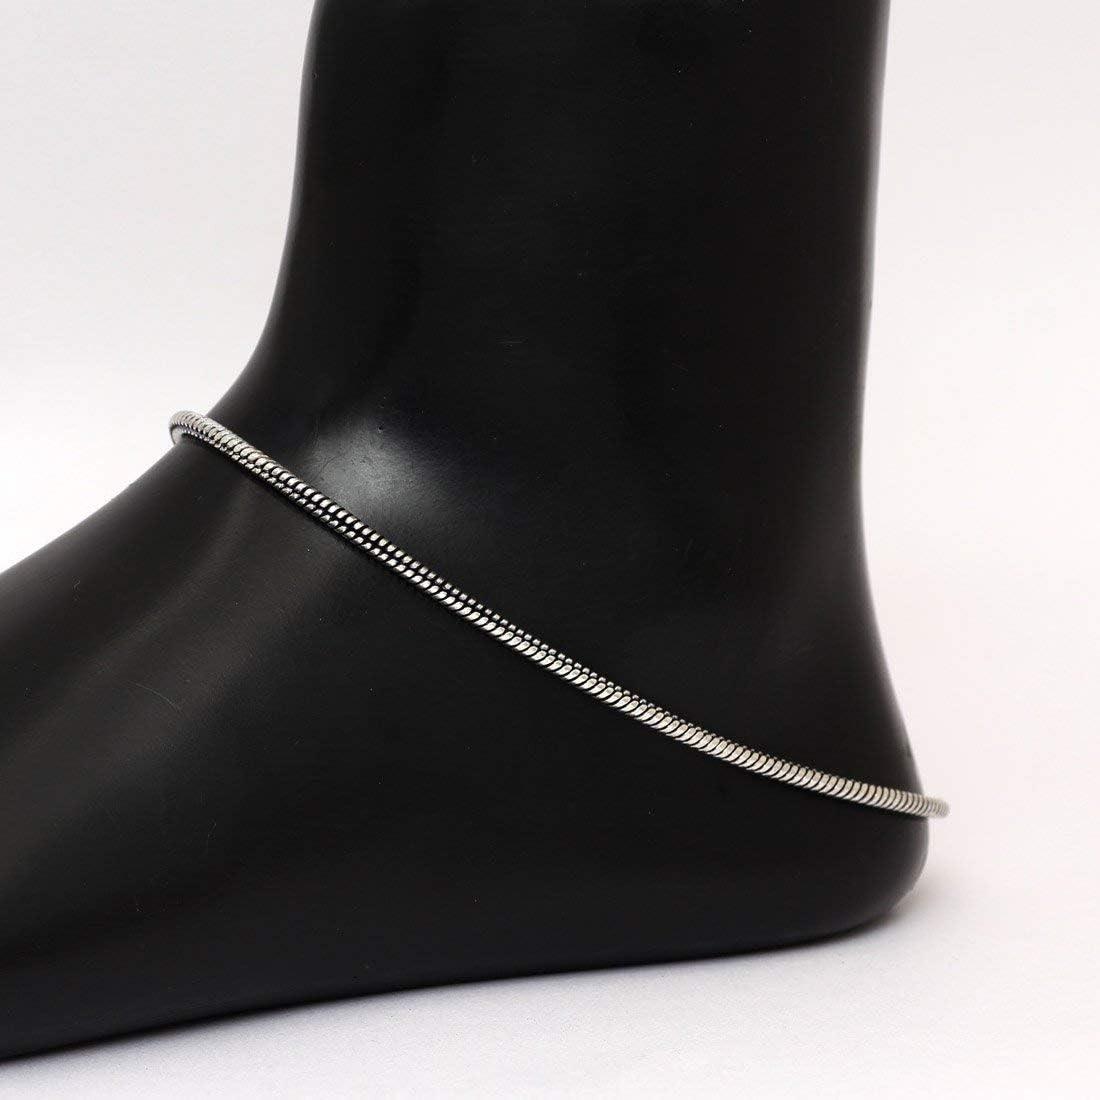 Payal ANK151SLV Anklet Bracelet For Women Indian Anklets For Women Bollywood Ankle Bracelet Anklets For Women Indian Anklets For Women With Bells Anklets For Girls Payal Anklet Indian